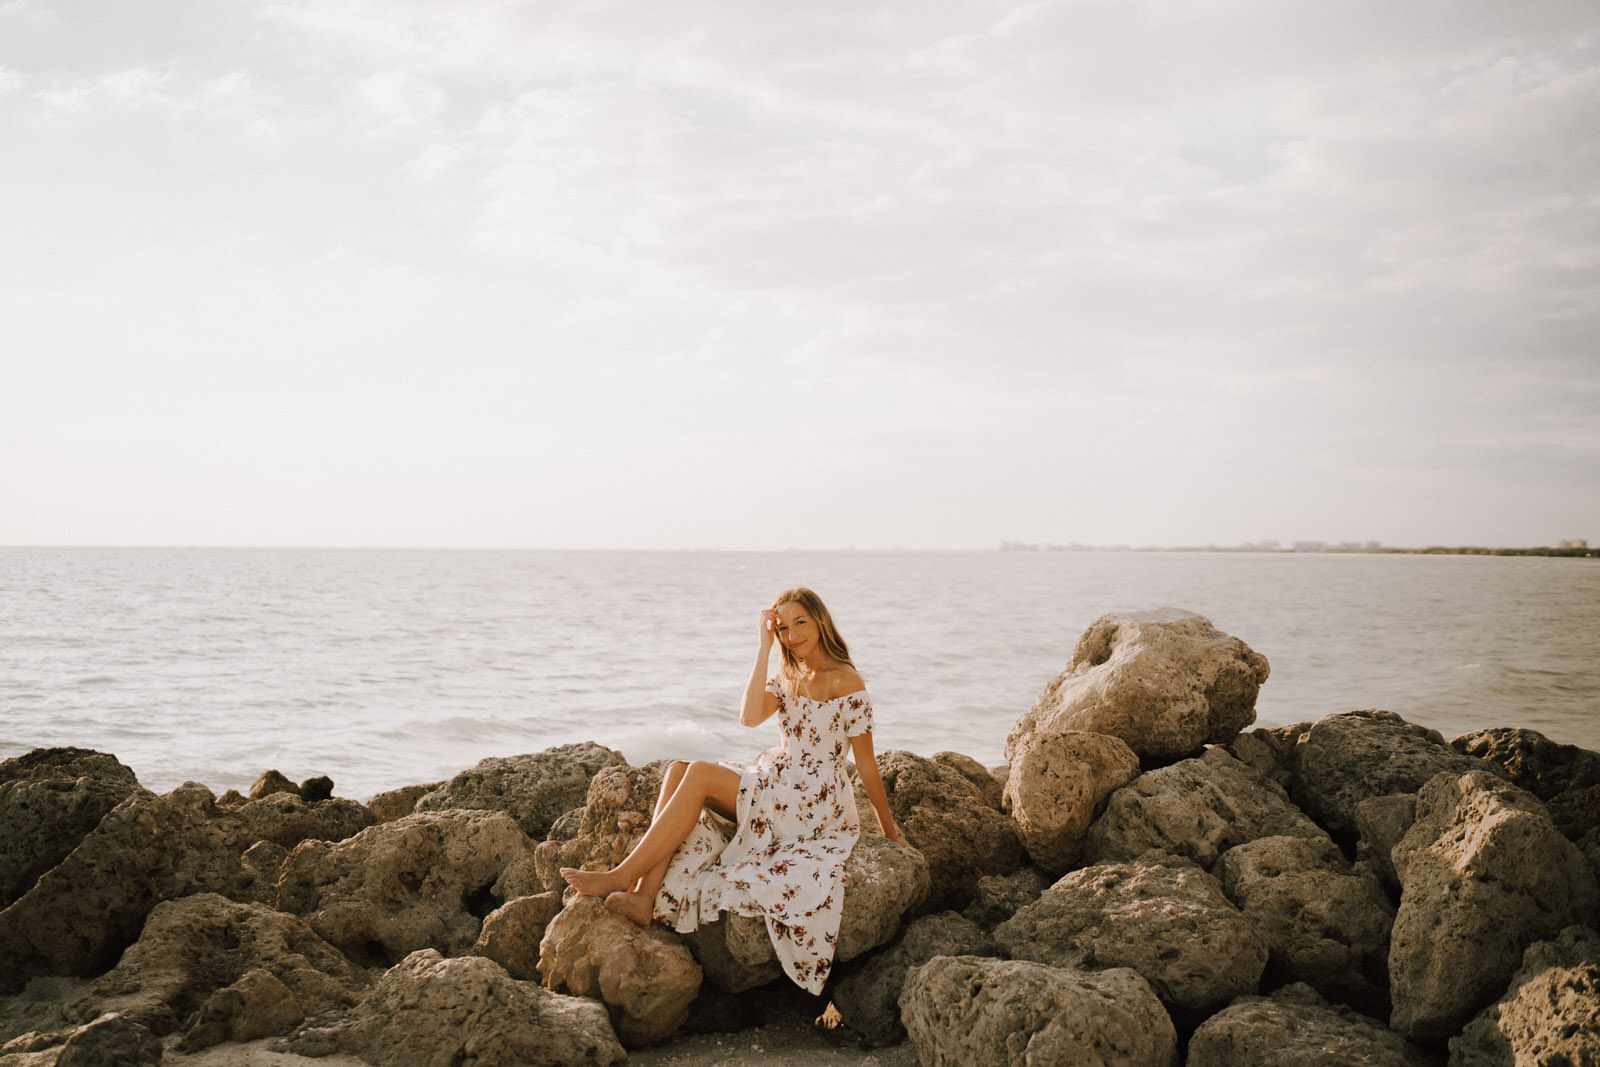 Fort Myers Senior Photos on Bonita Beach - Michelle Gonzalez Photography - Sammie-19.JPG